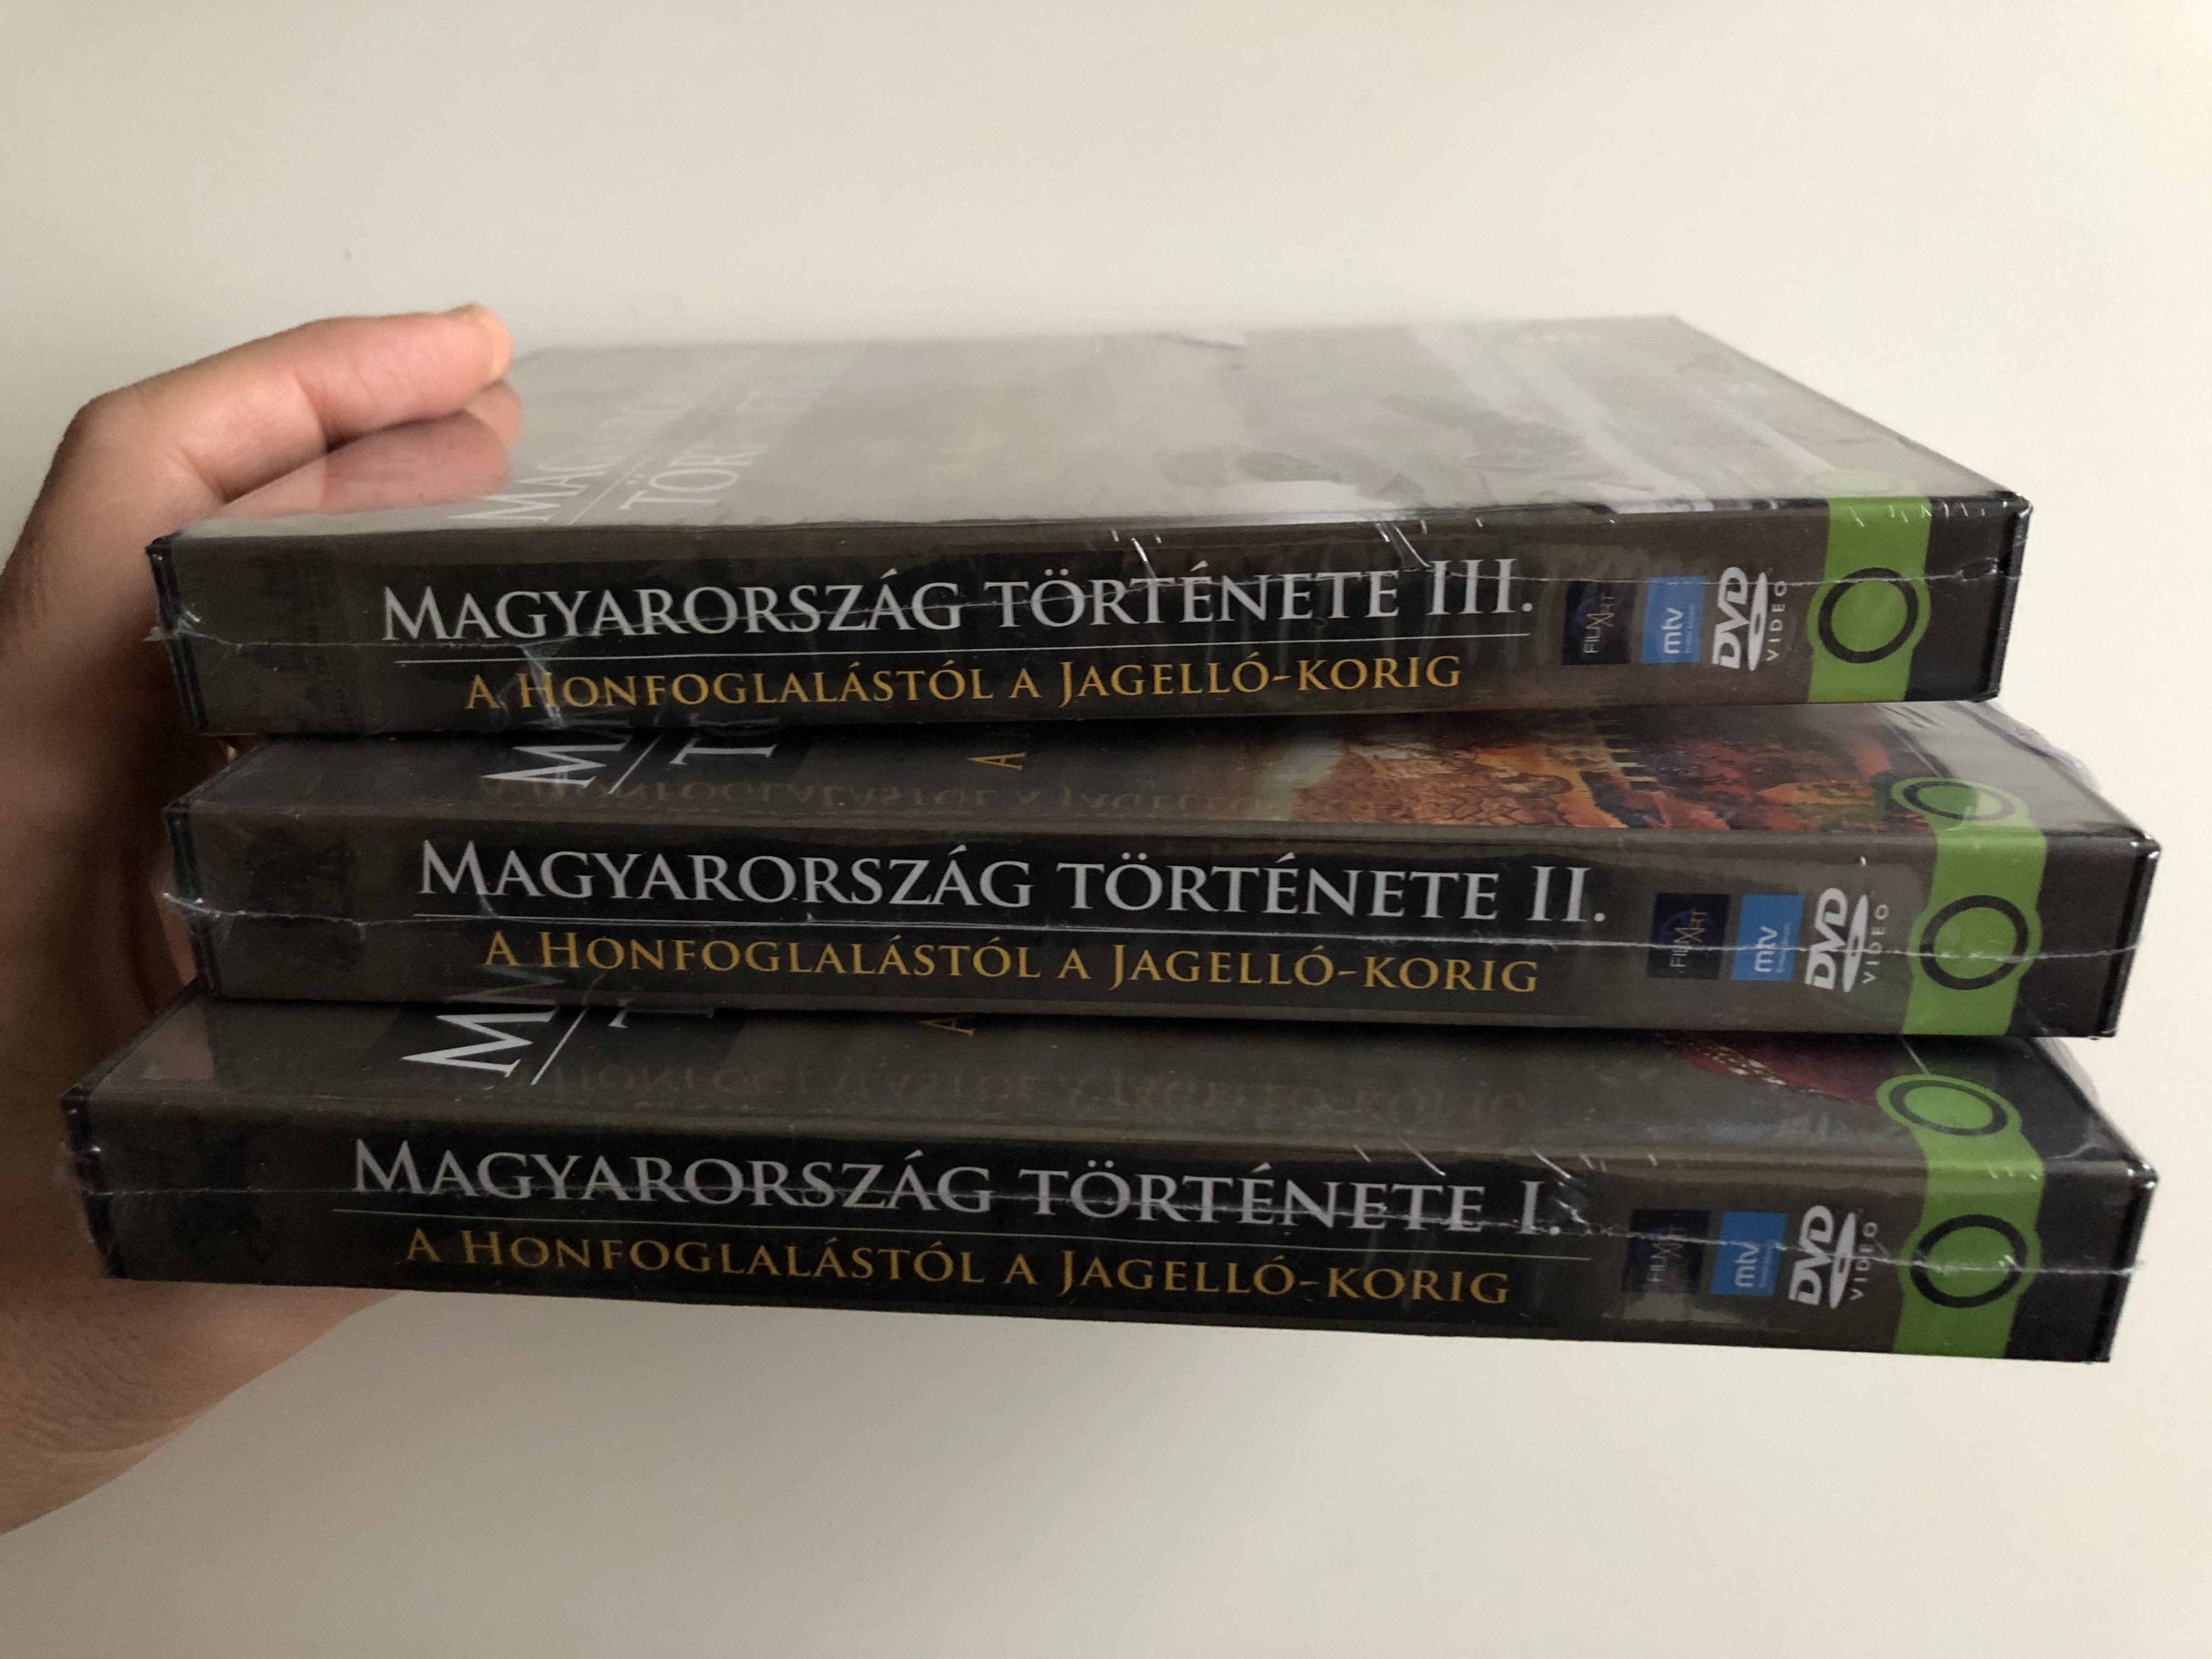 magyarorsz-g-t-rt-nete-i-iii-dvd-full-set-2.jpg